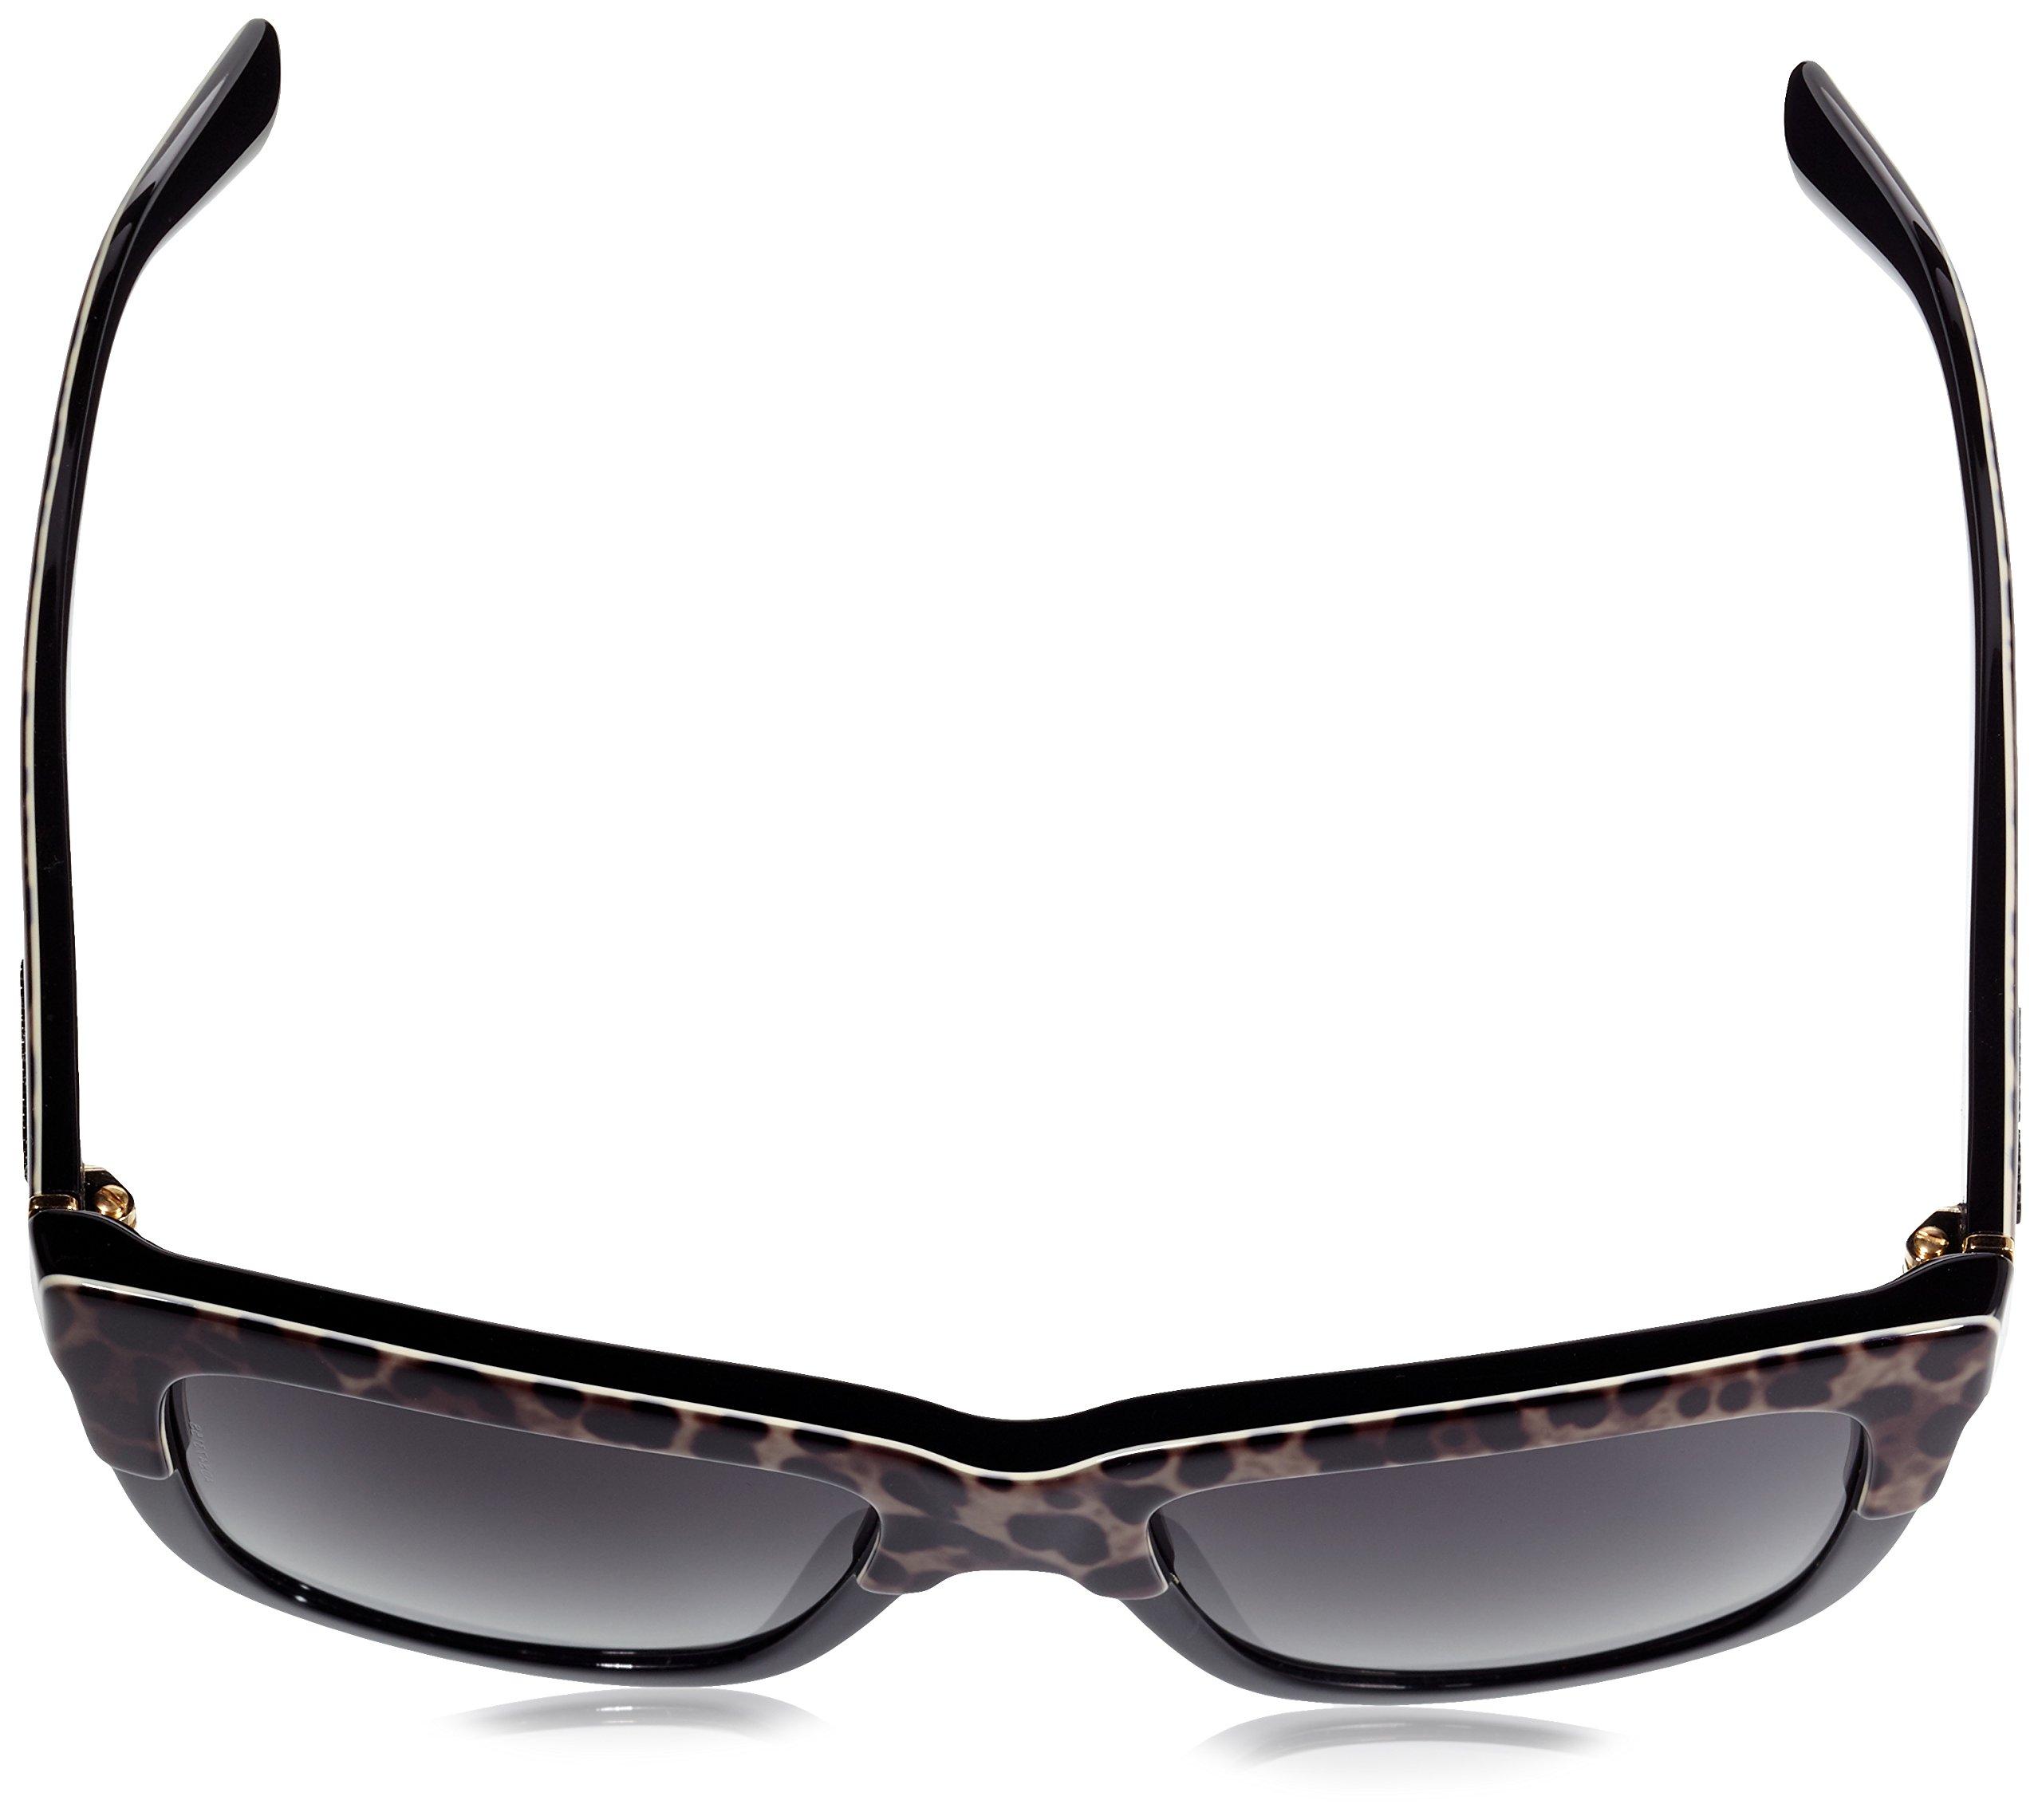 D&G Dolce & Gabbana Womens 0DG4262 Polarized Square Sunglasses, Top Leo On Black, 54 mm by Dolce & Gabbana (Image #4)